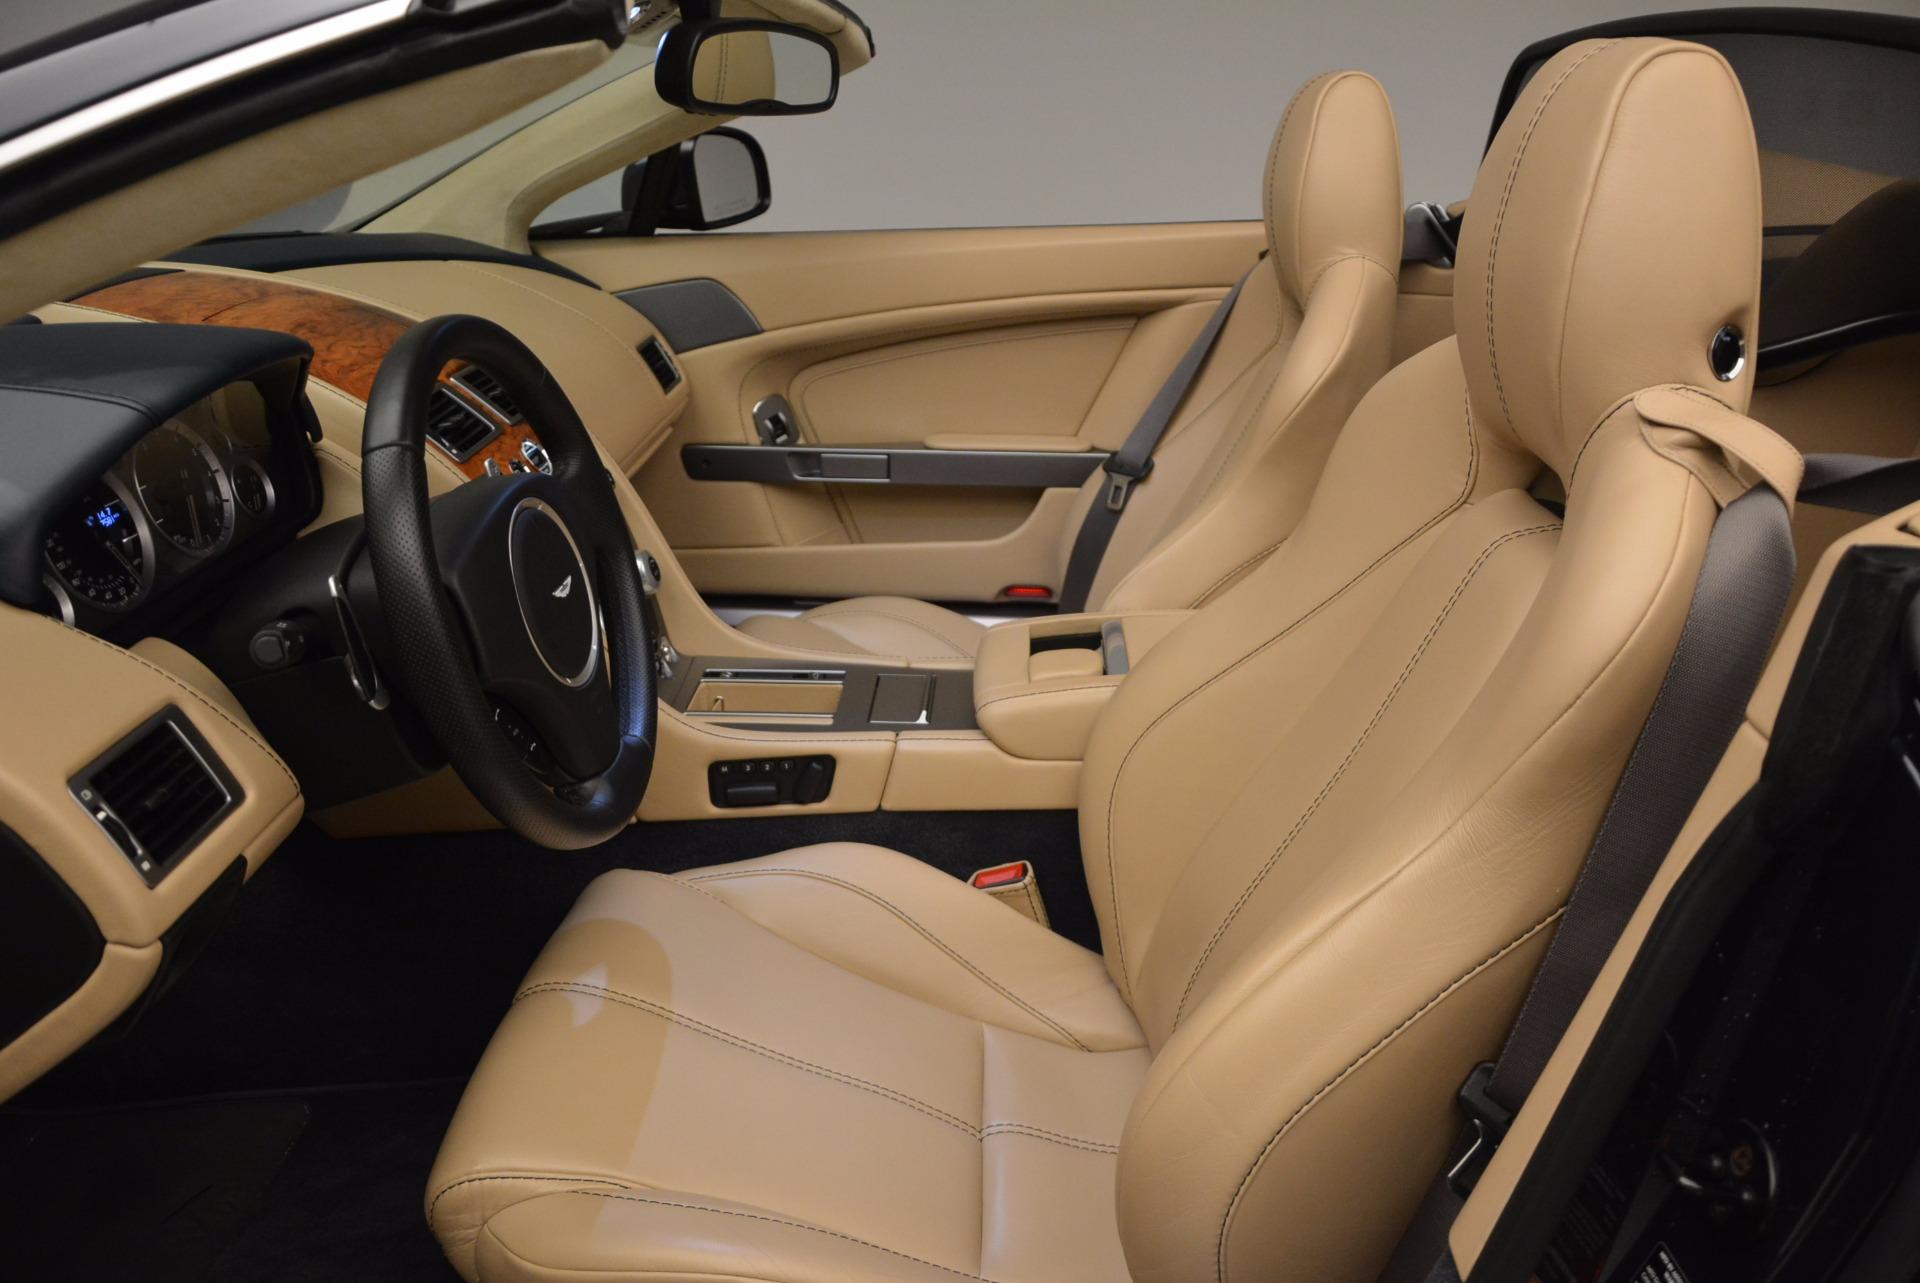 Used 2014 Aston Martin V8 Vantage Roadster For Sale In Westport, CT 1623_p20